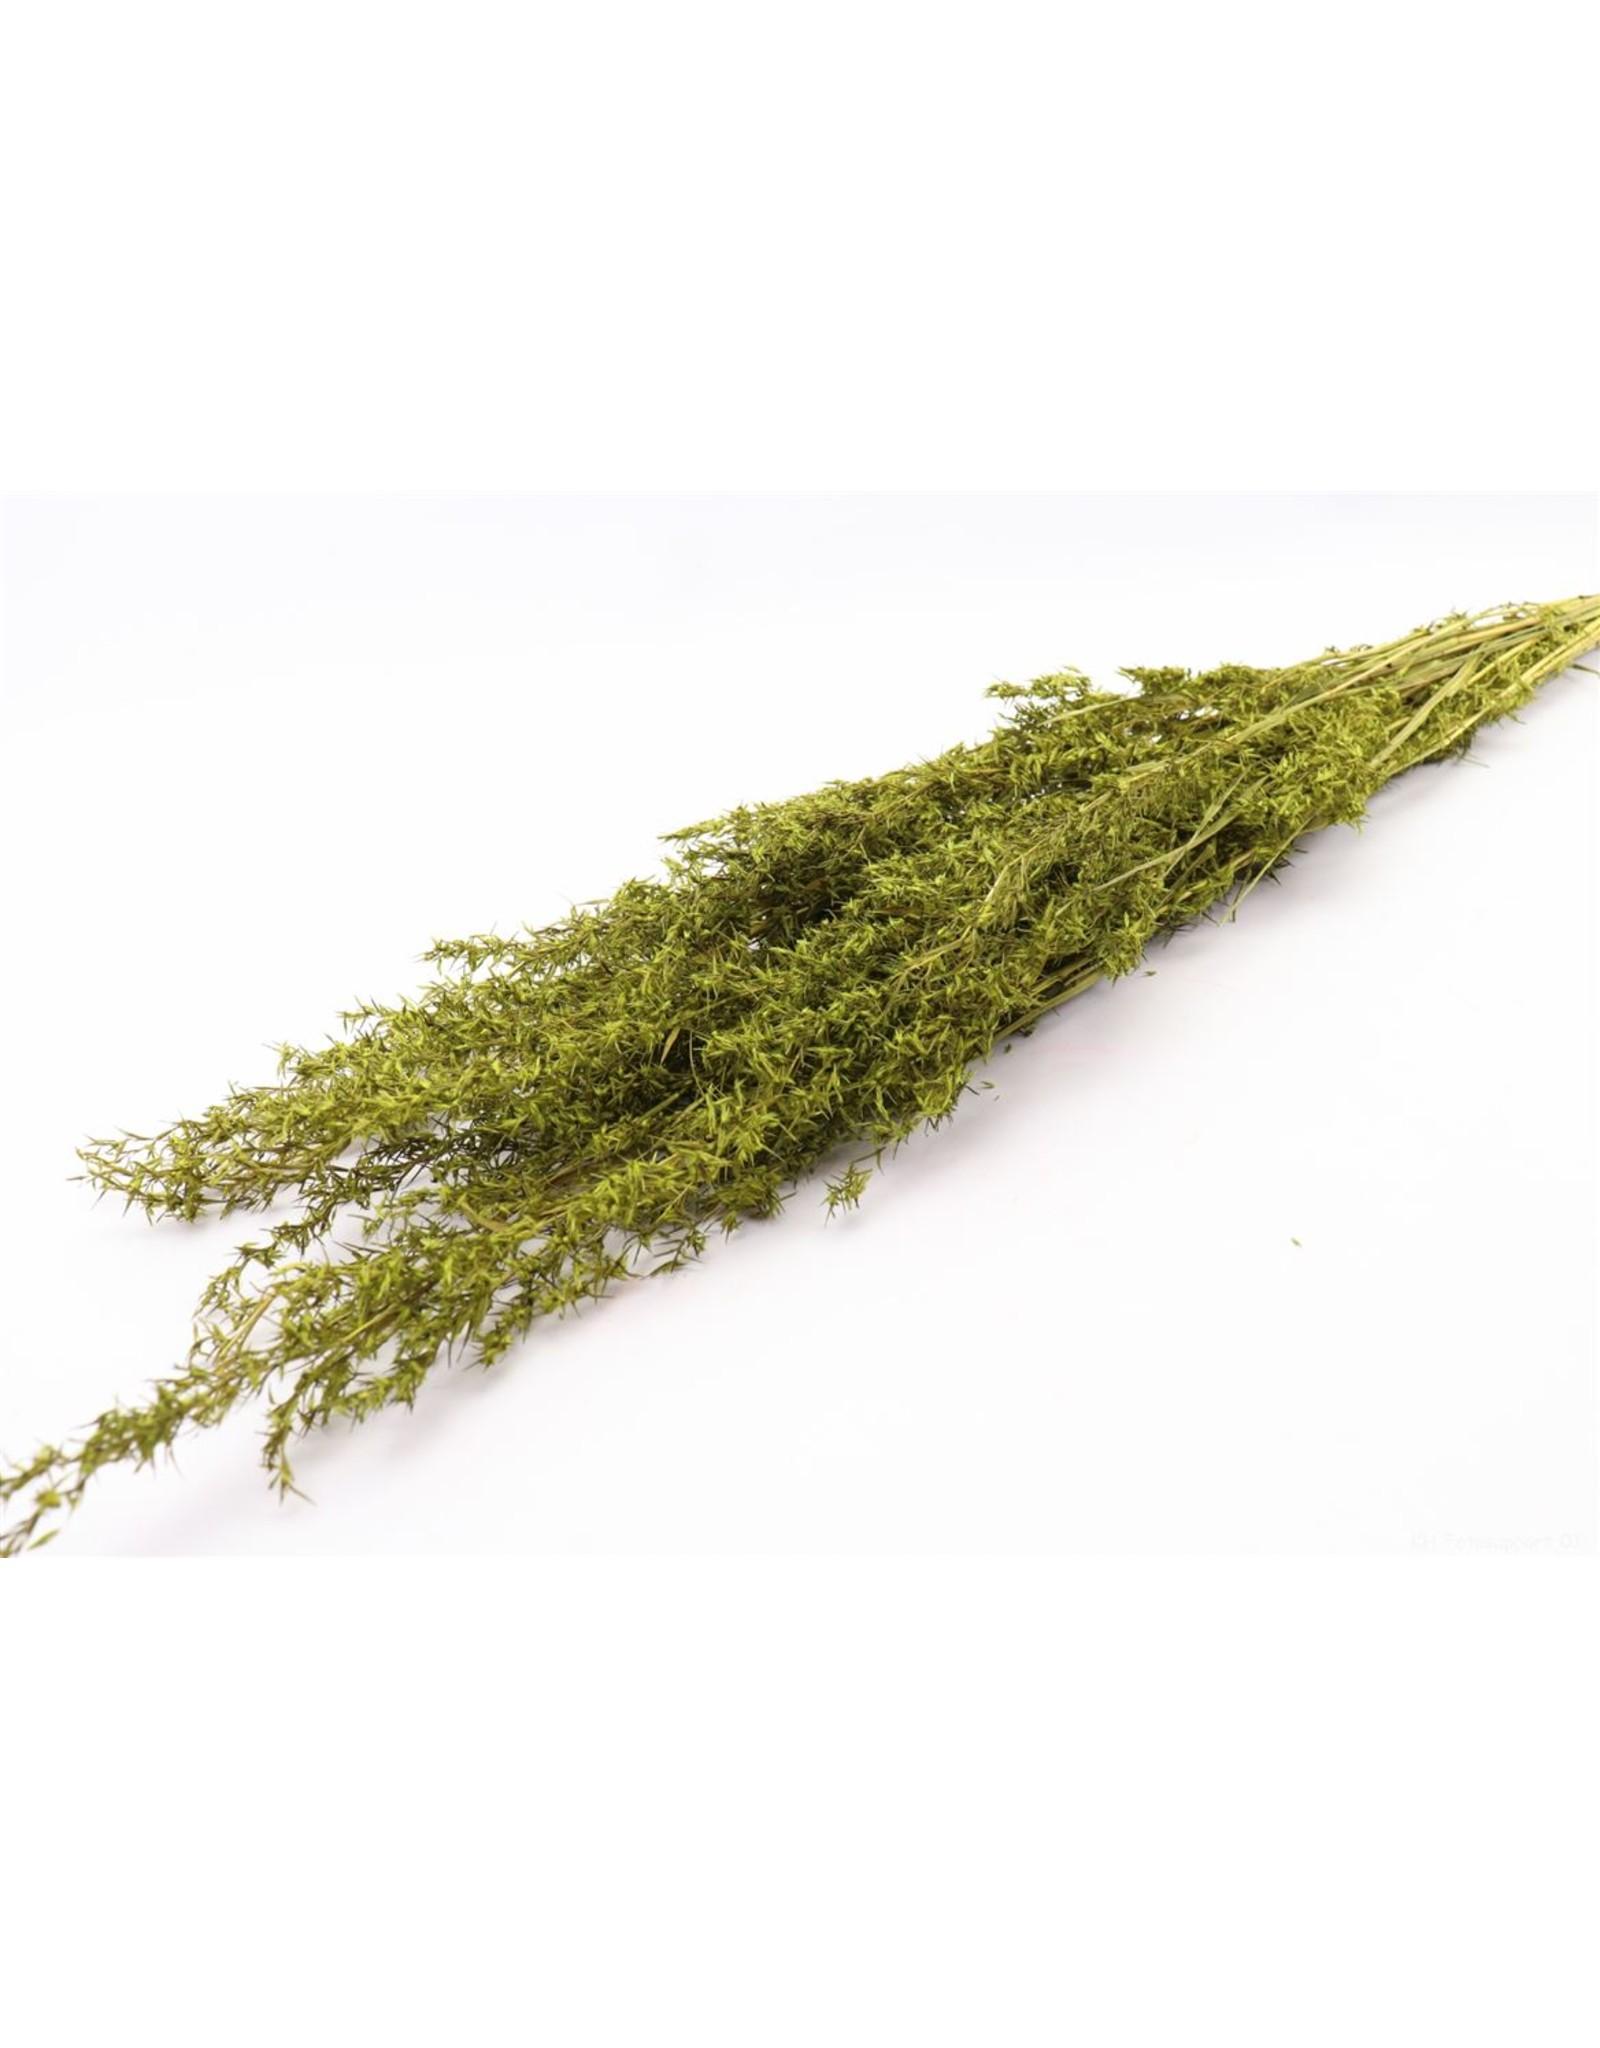 HD Bündel Beta Grass Slv 100gr  ↑100.0 (x 24)